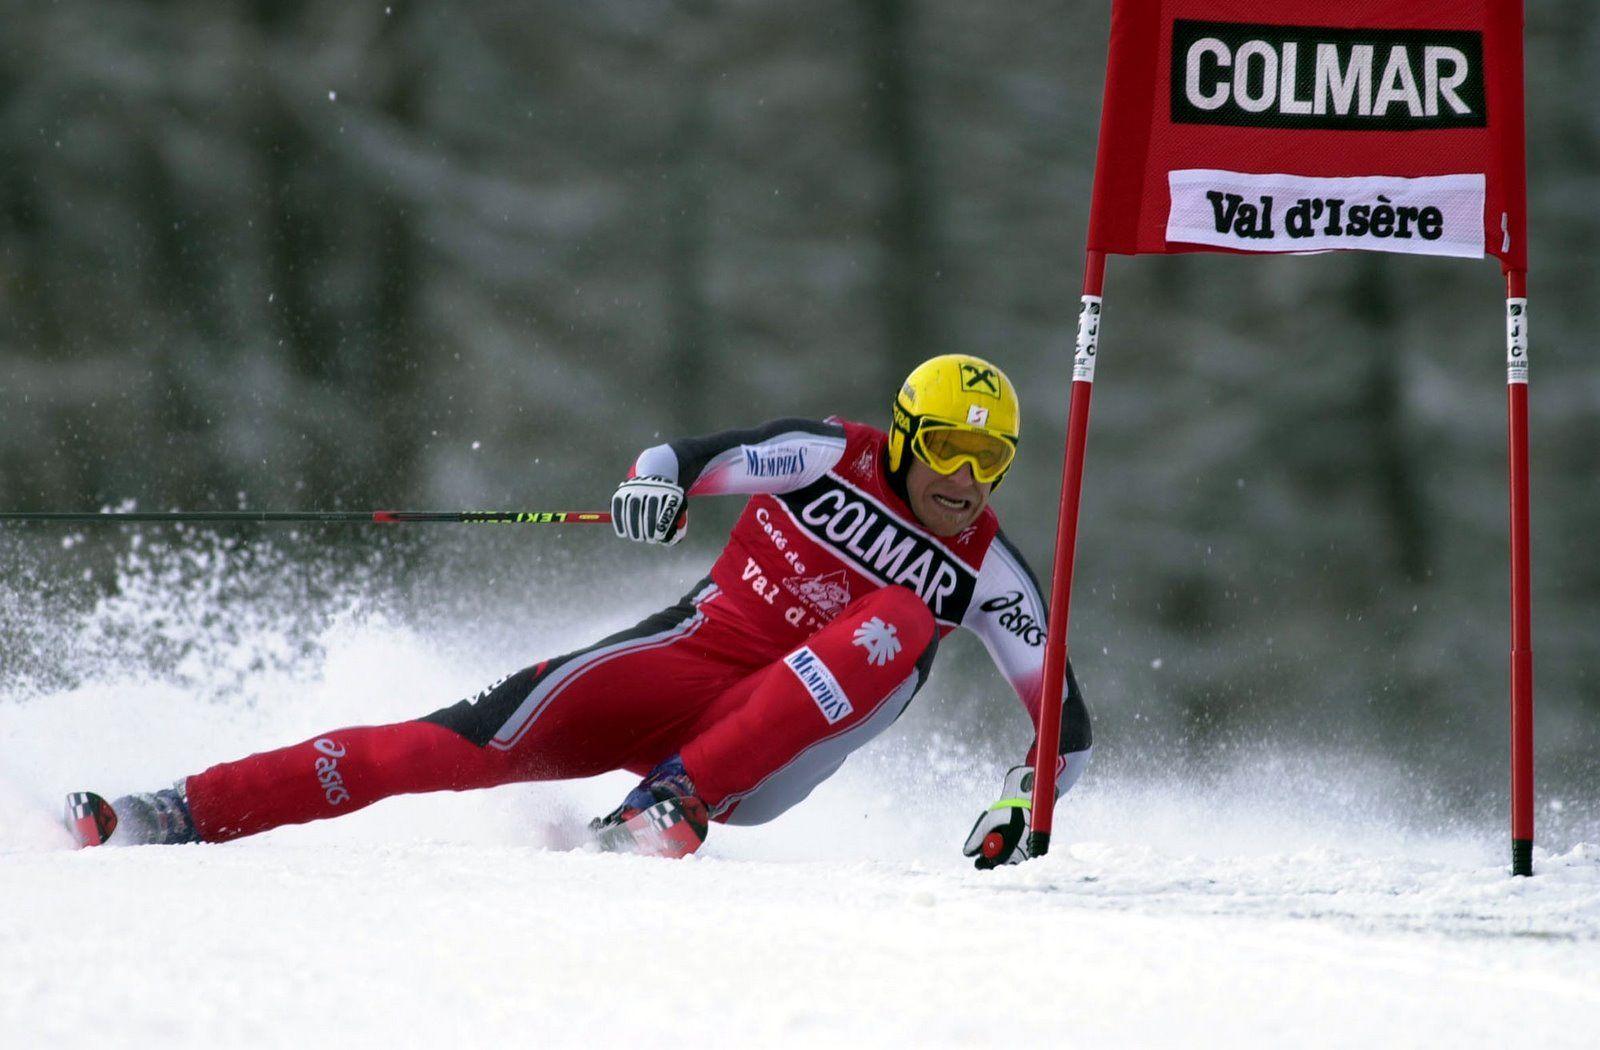 Hermann Maier Ski racing, Ski mountain, Sports